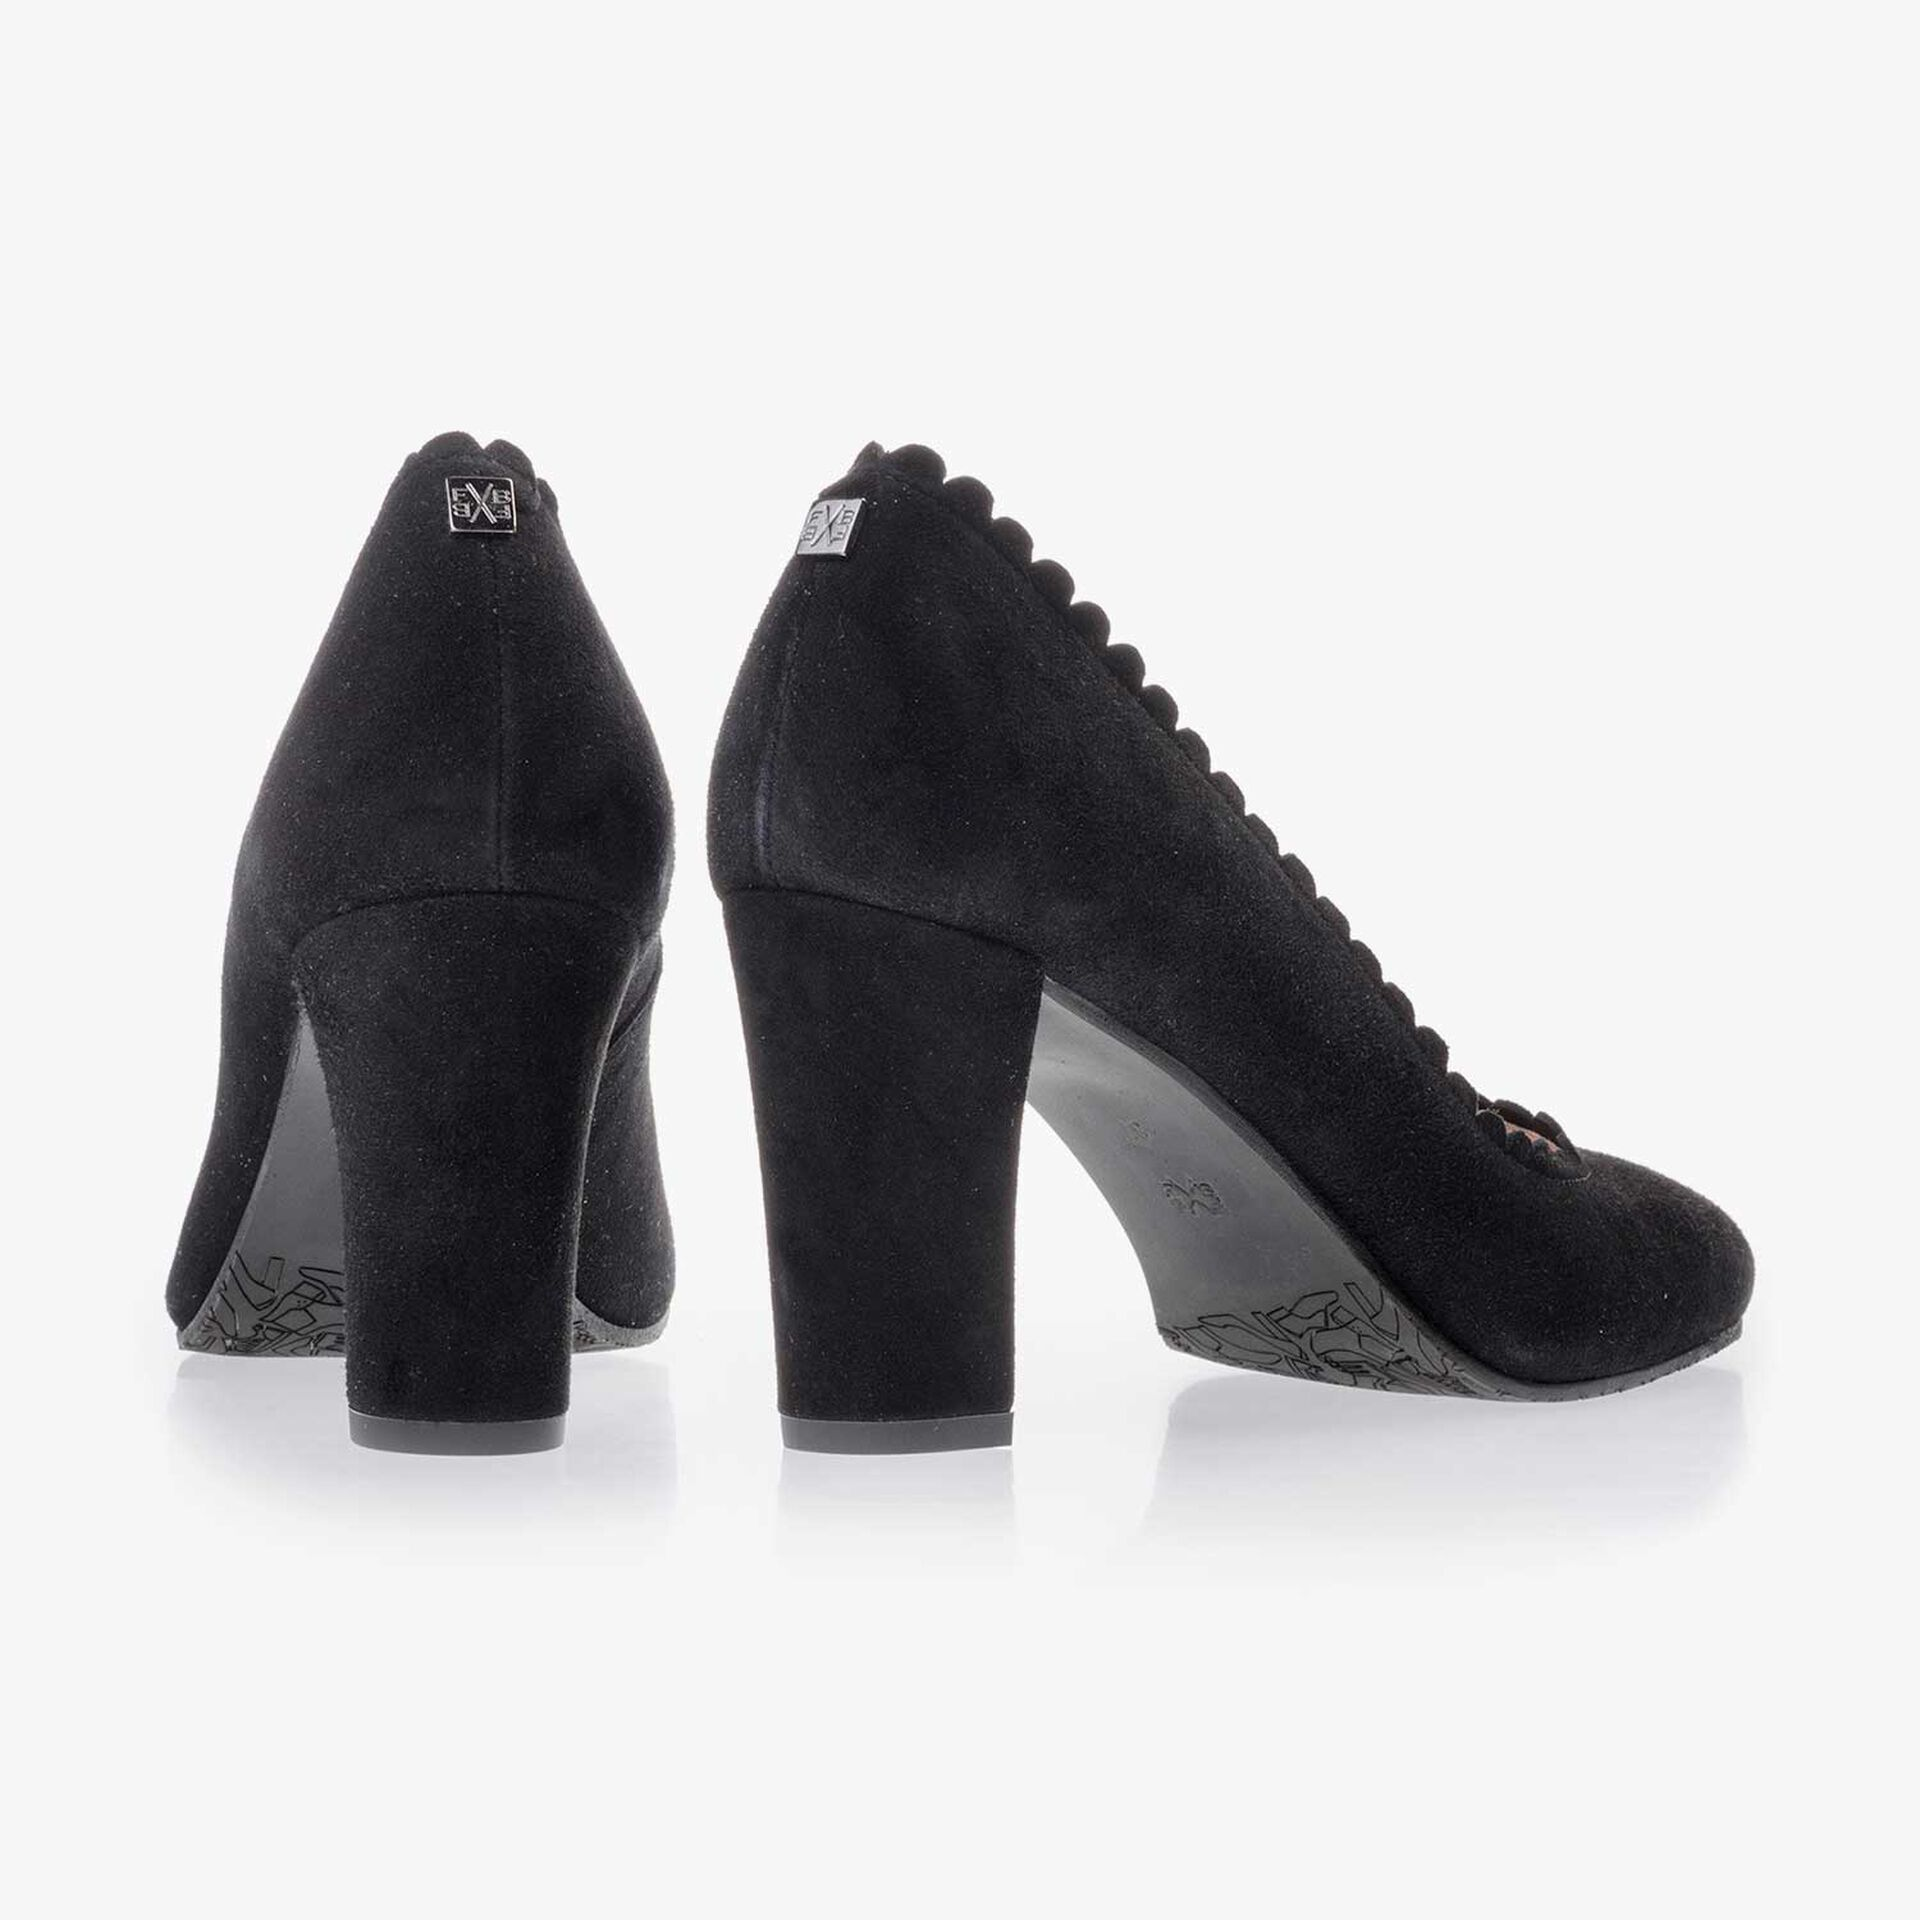 Black calf's suede leather pumps